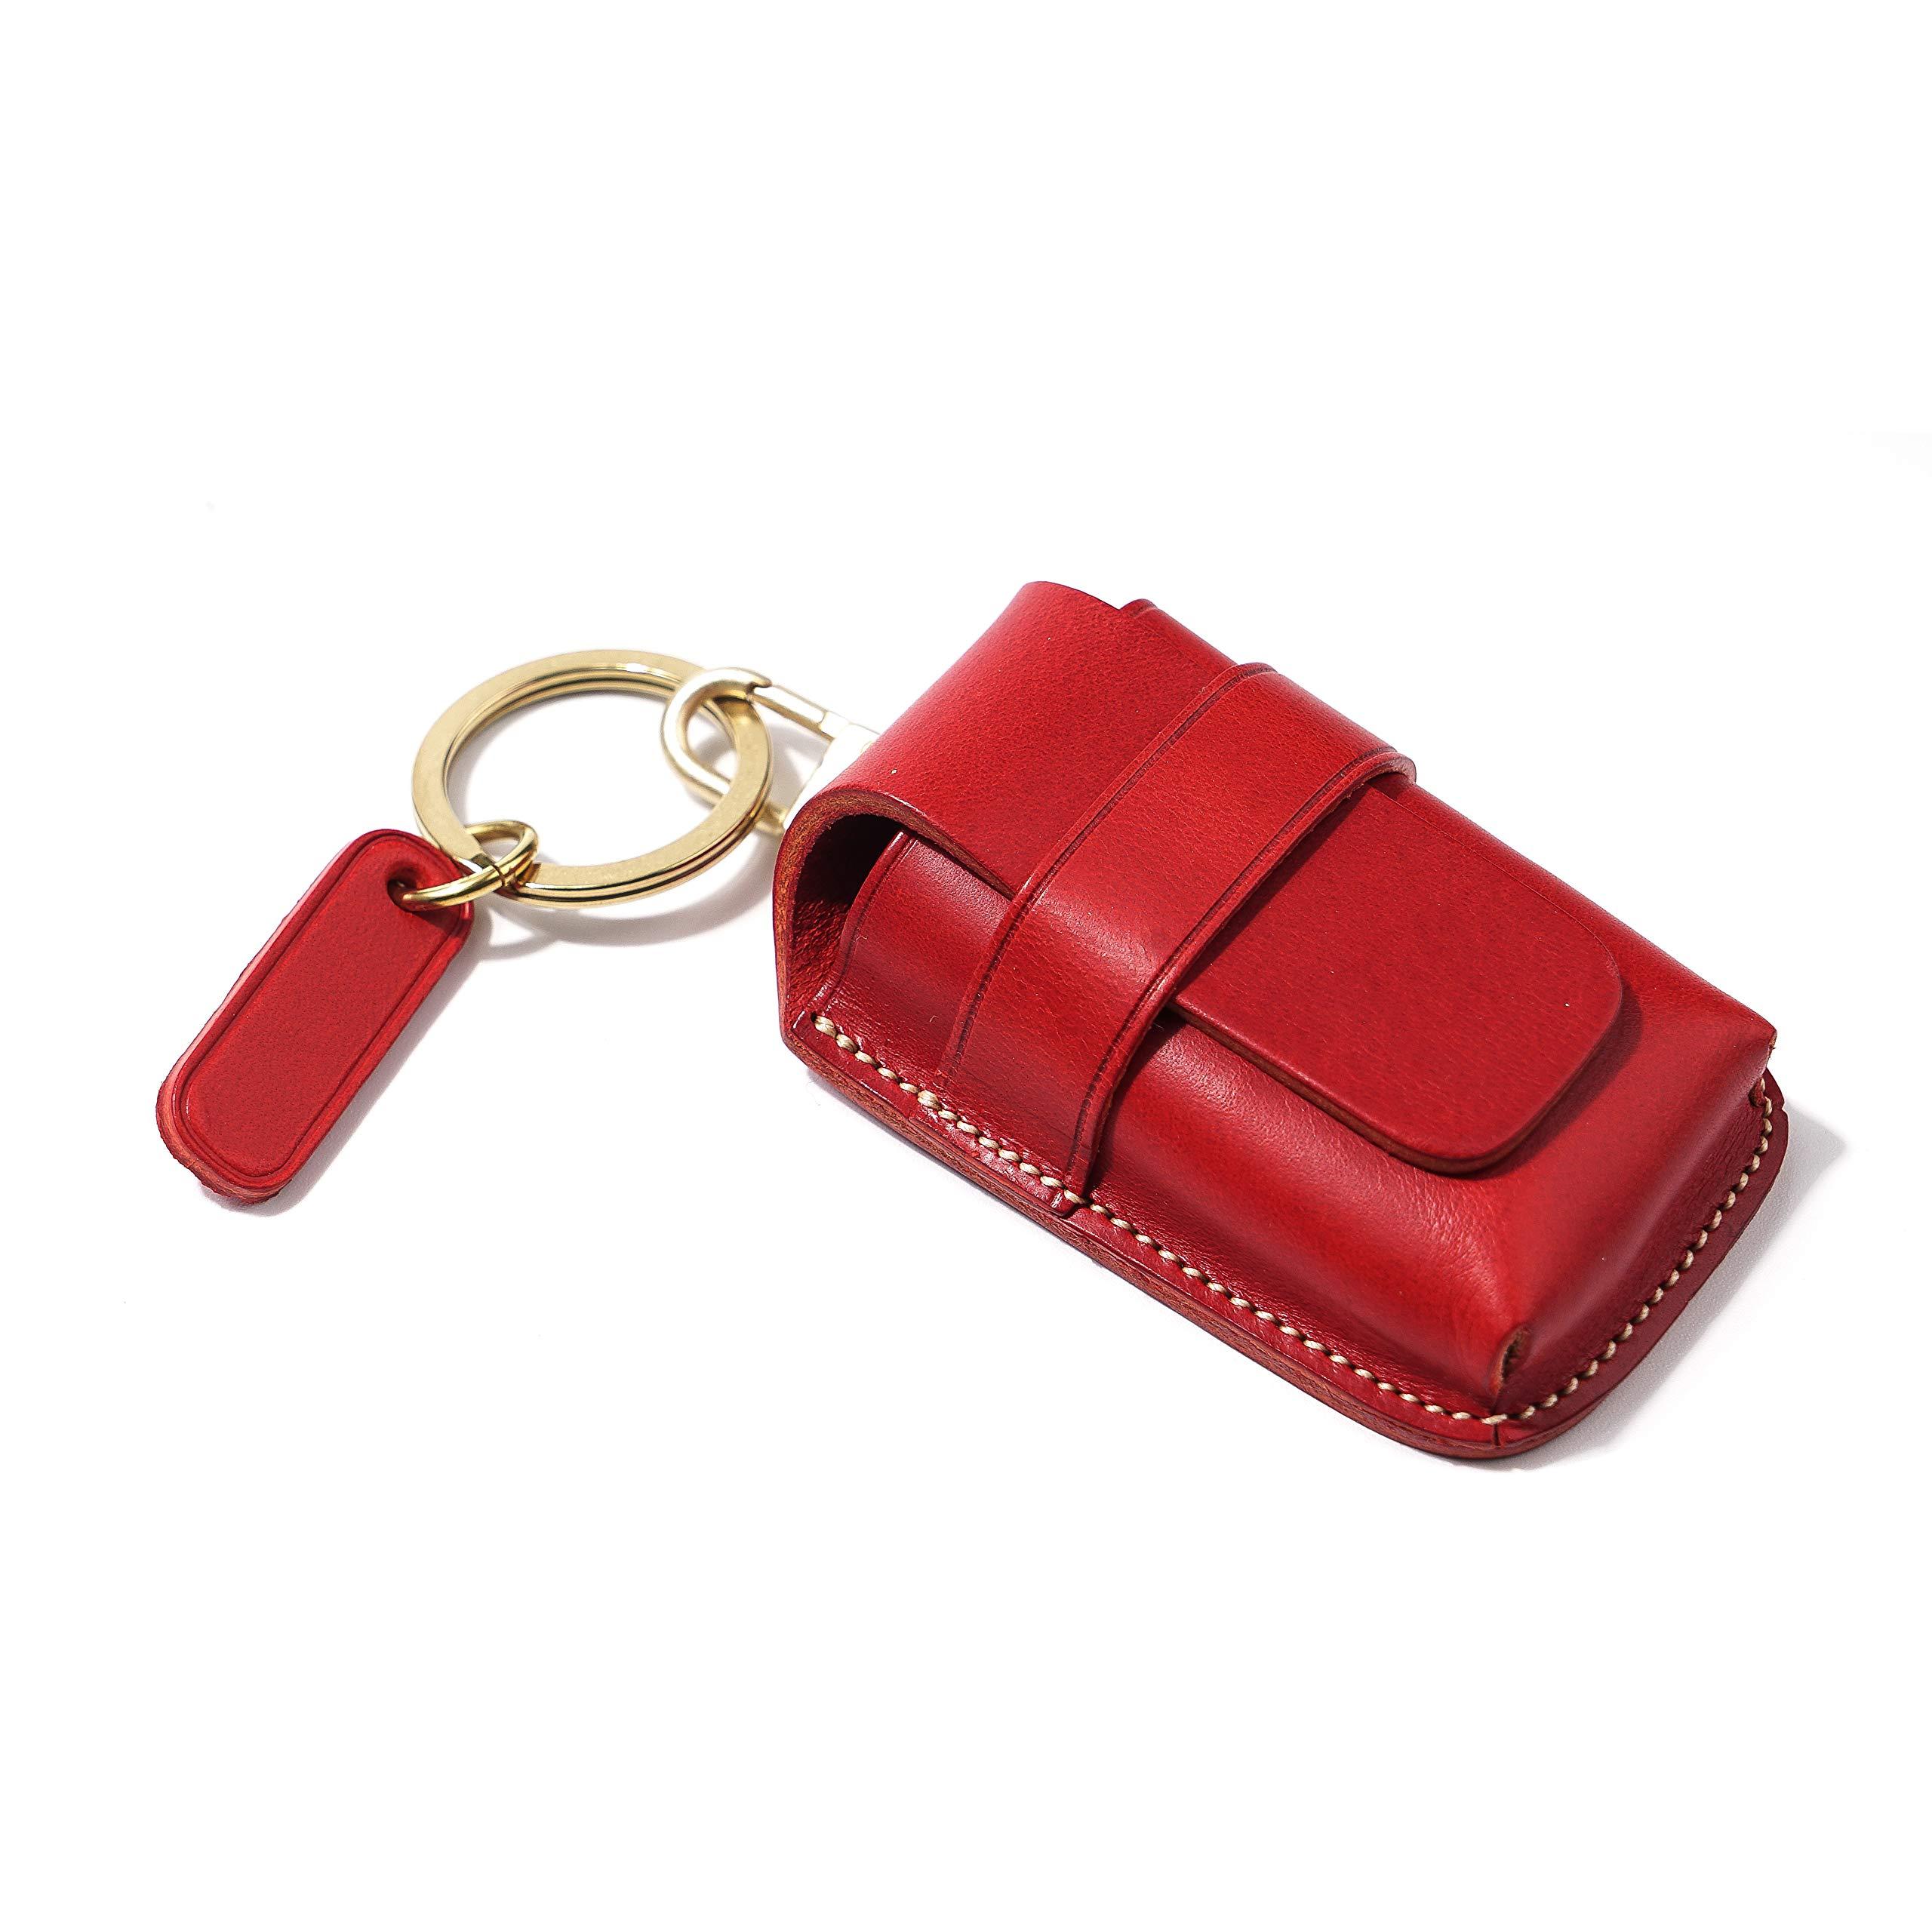 hevitz 7700 Universal Smart Key Pouch Red